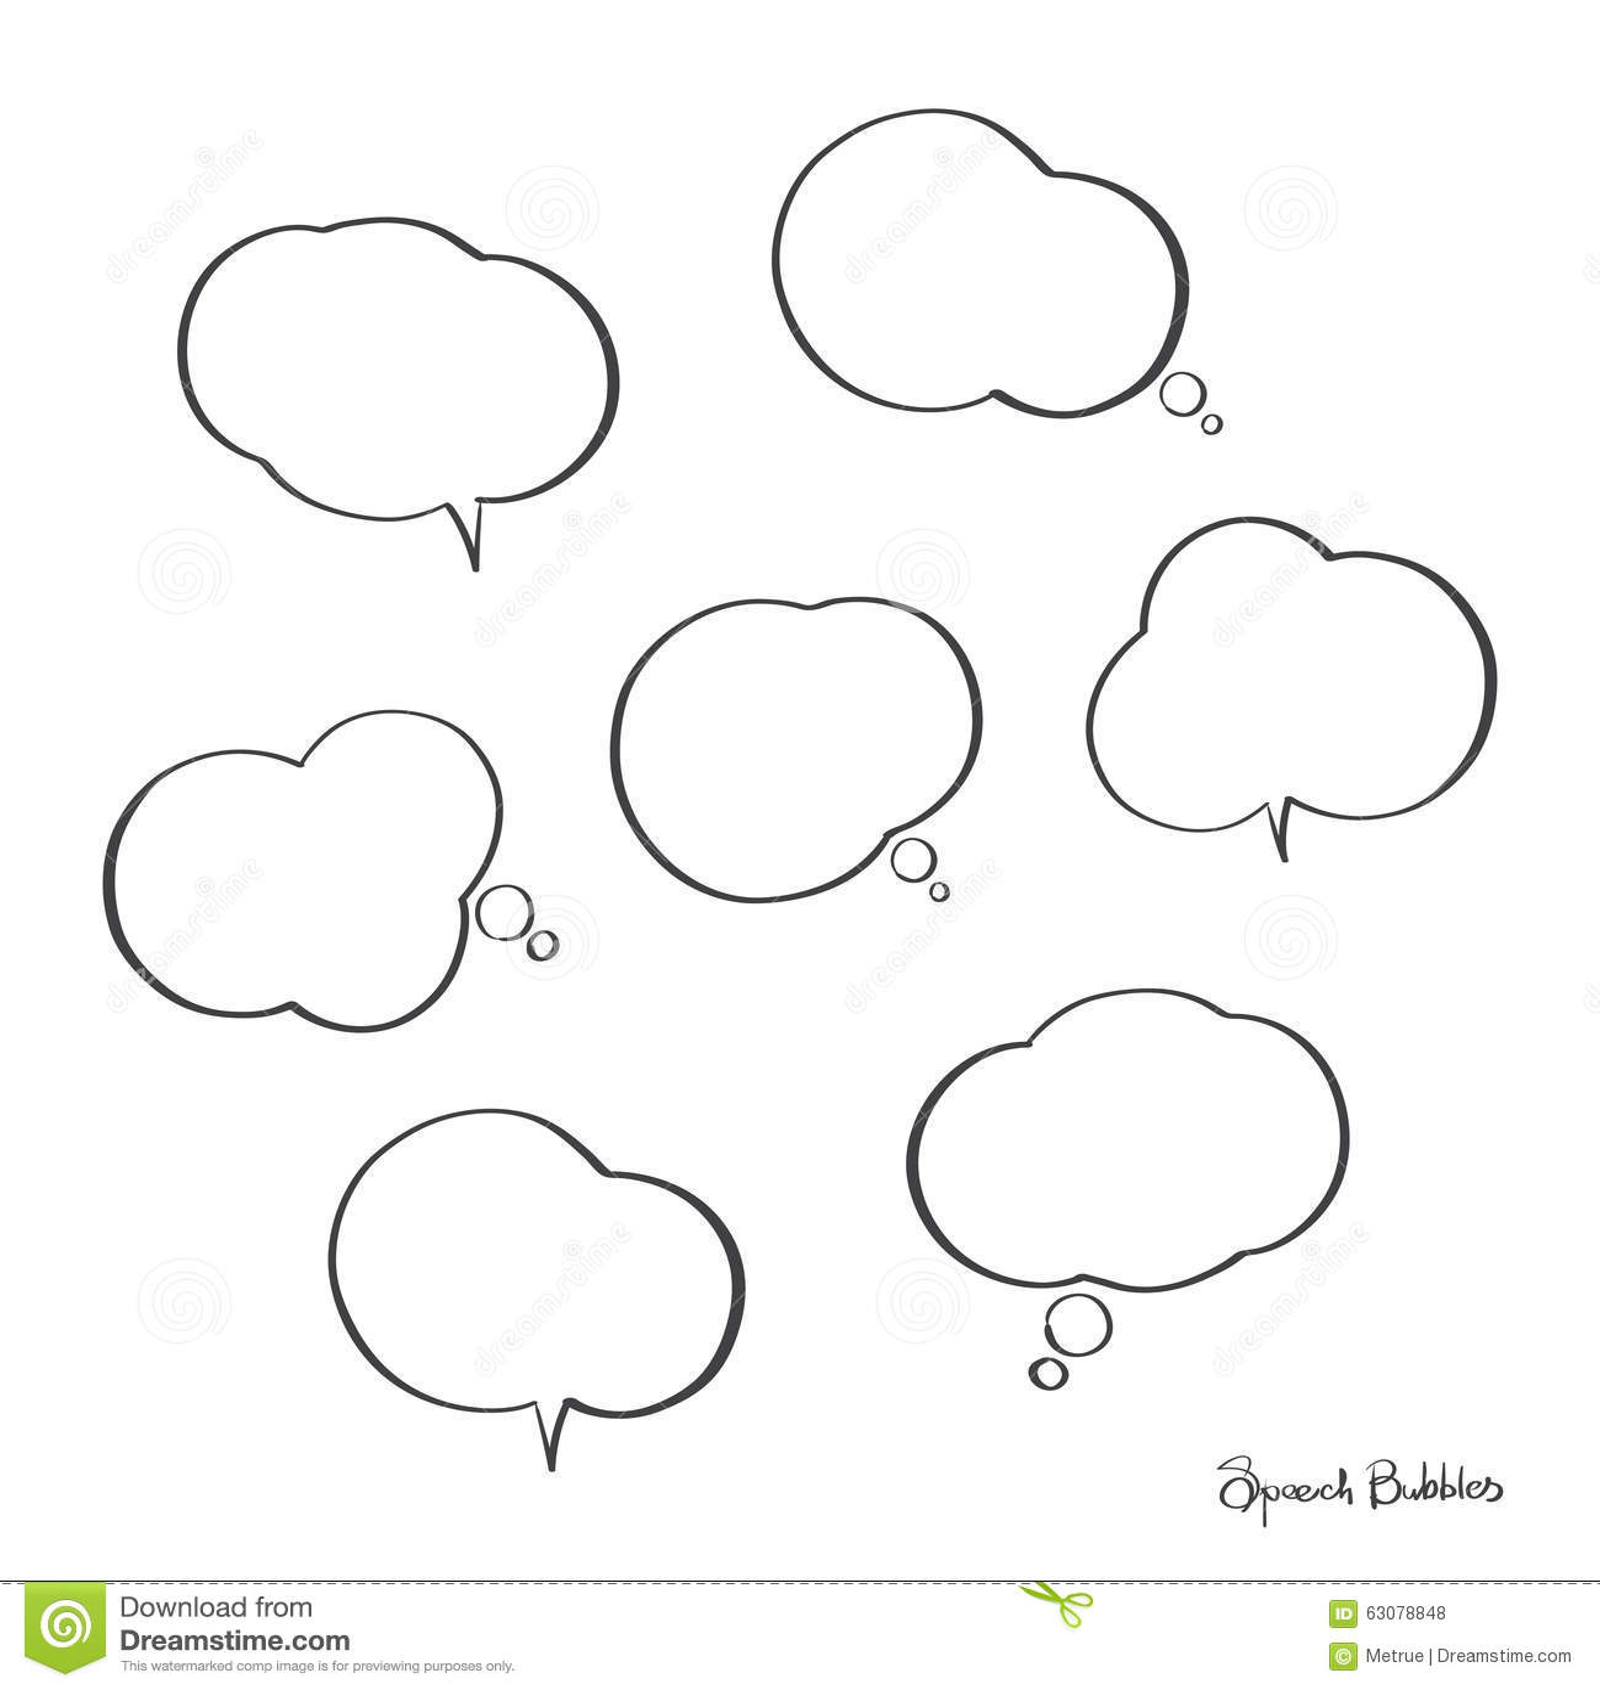 Mono bubbles stock illustration. Illustration of bubbles